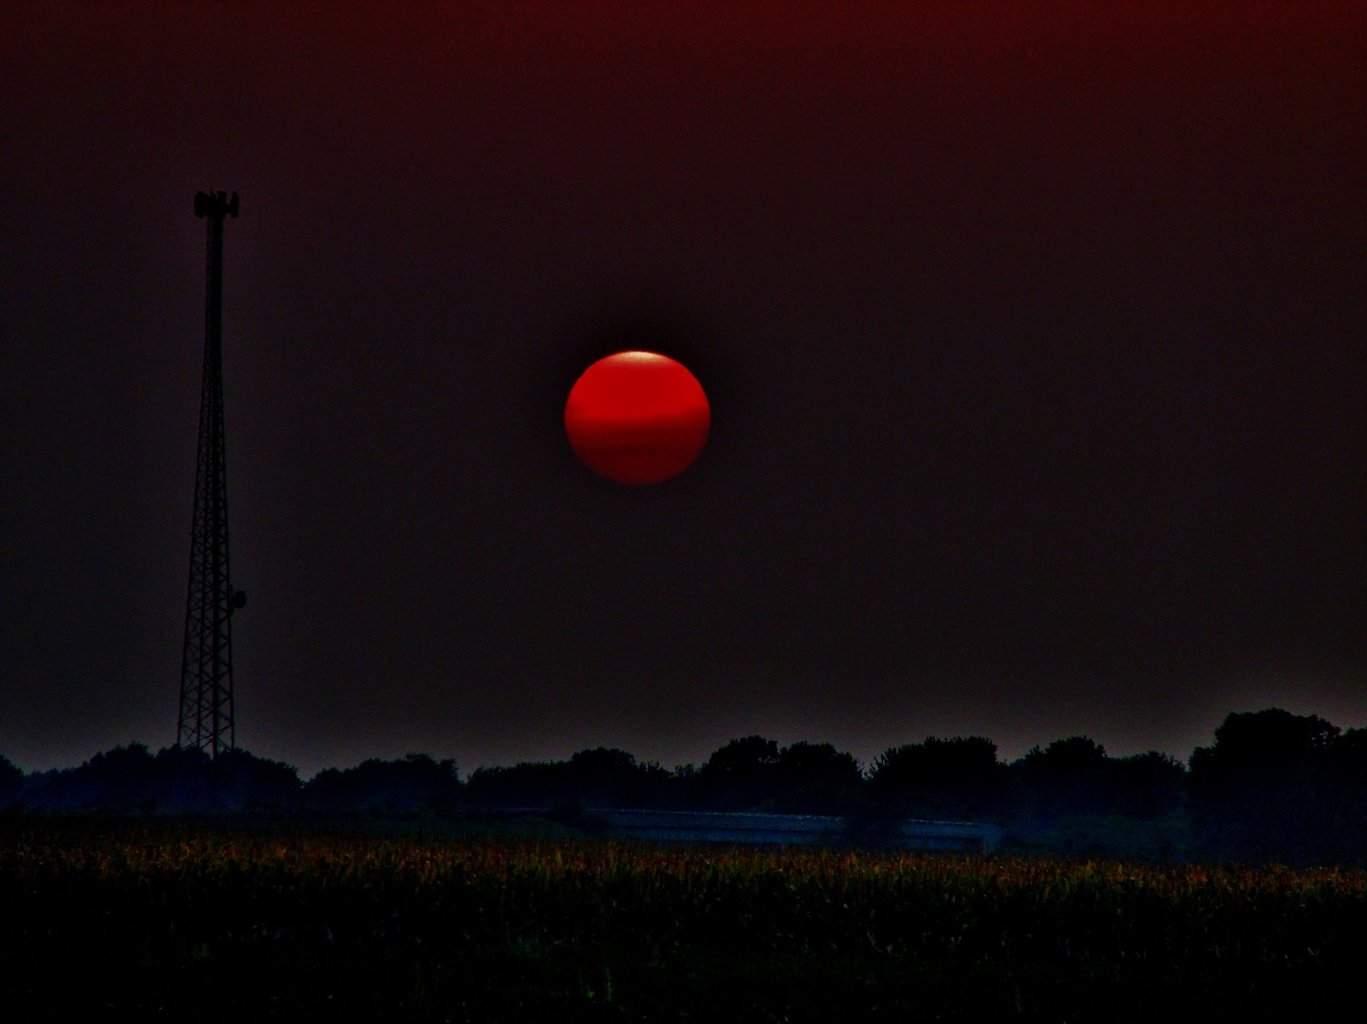 Caught a red sun.